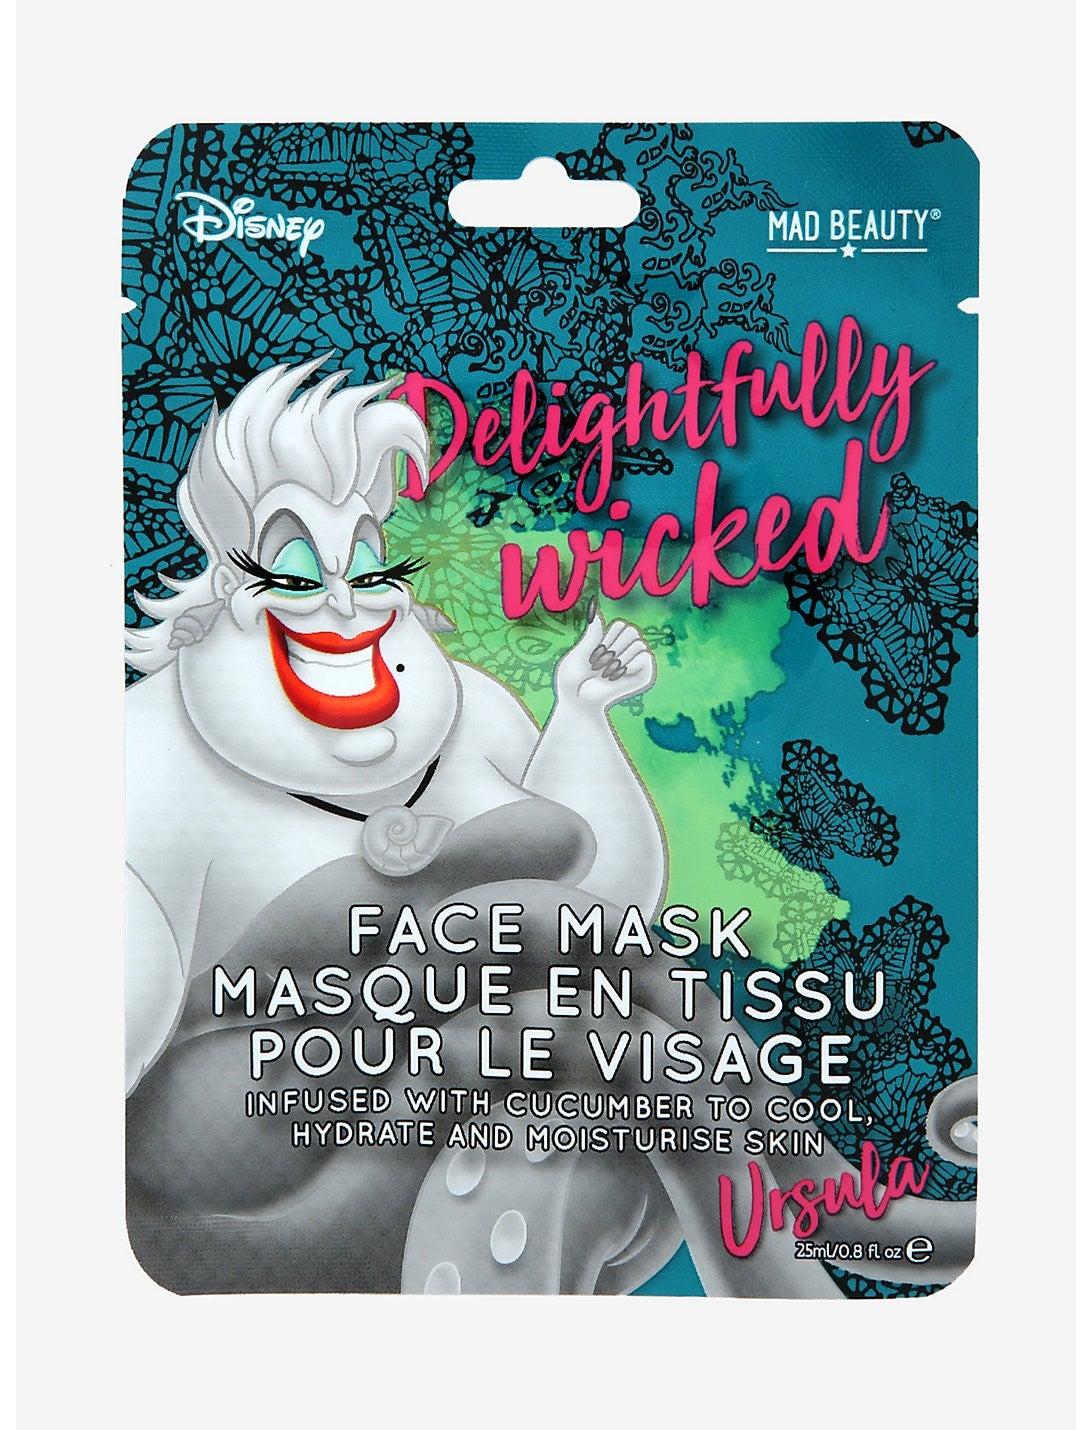 Disney-The-Little-Mermaid-Ursula-Face-Mask.jpg